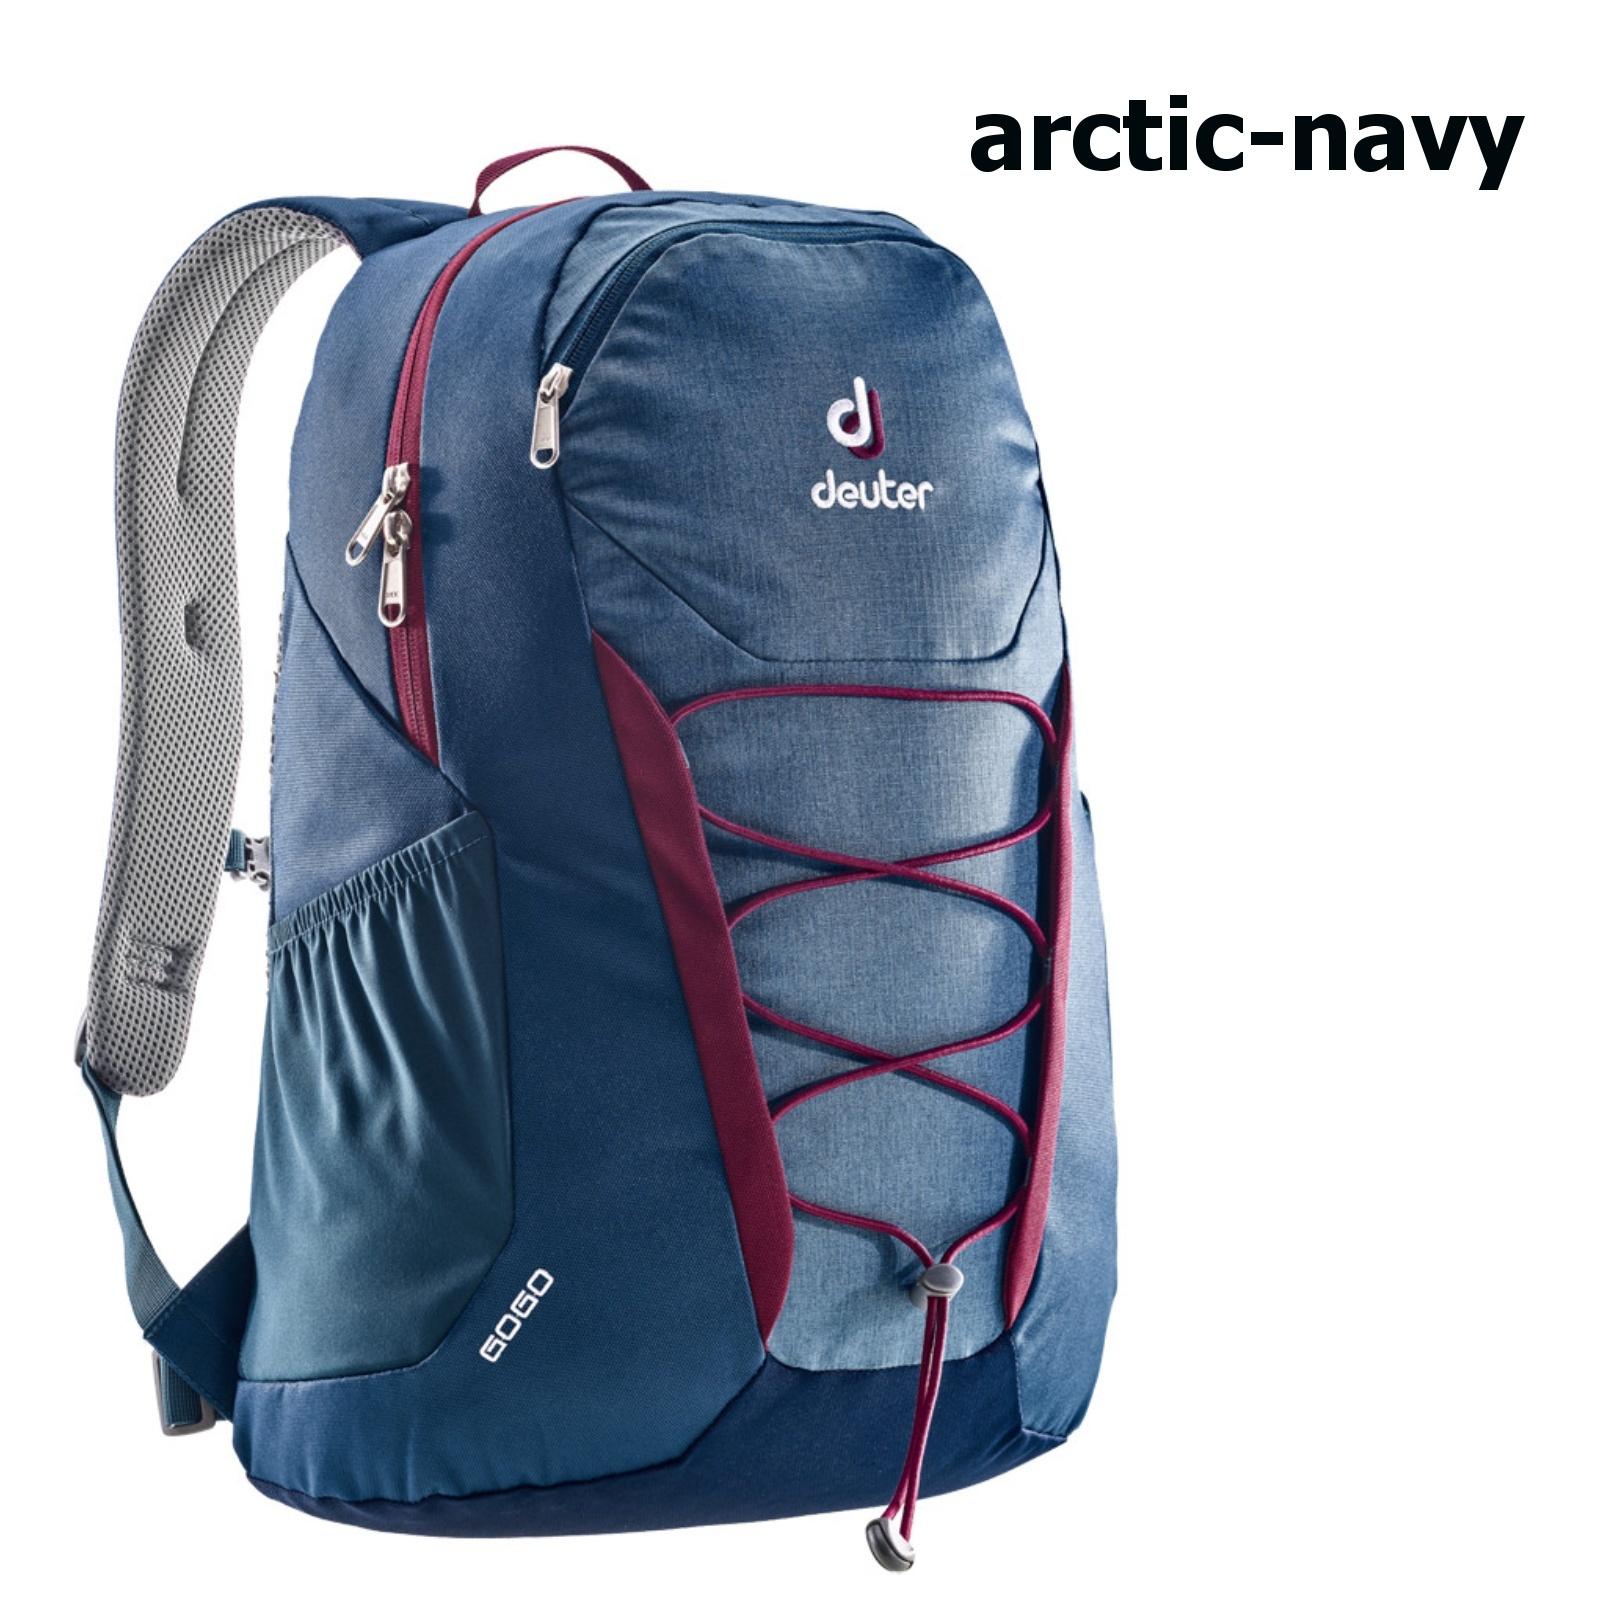 Deuter Gogo 25 arctic navy